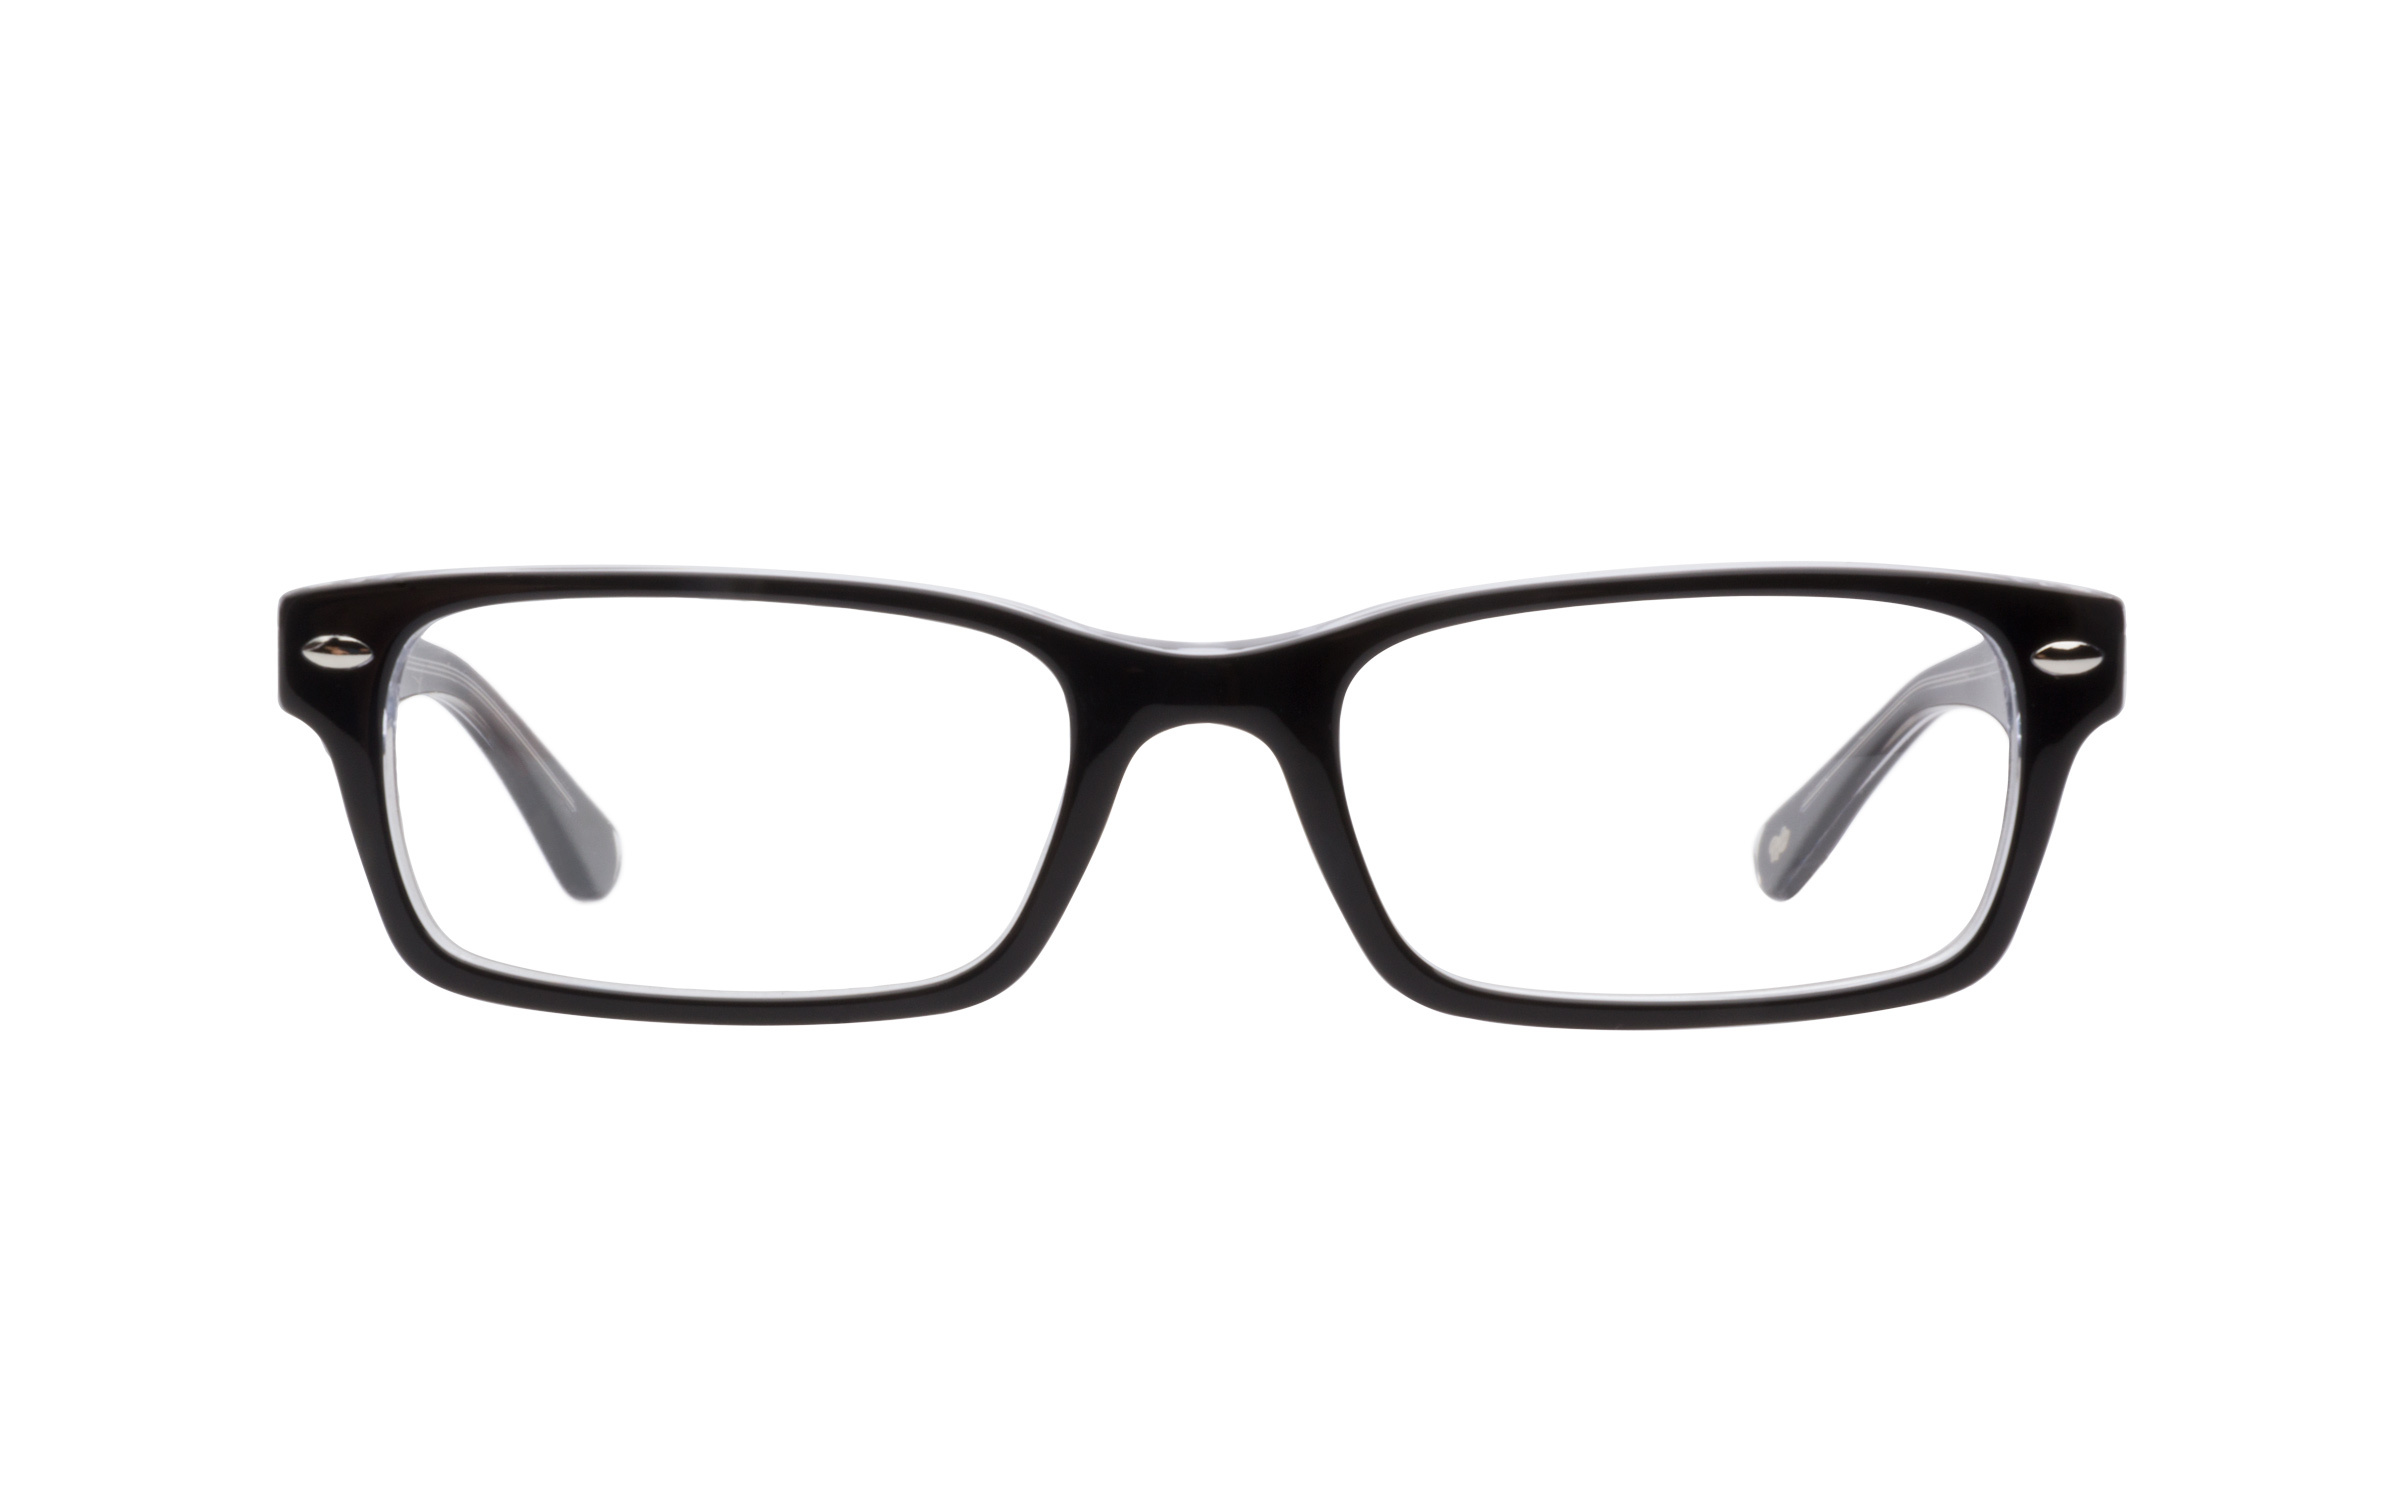 http://www.coastal.com/ - Ray-Ban Women's Glasses Classic Black Acetate Online Coastal